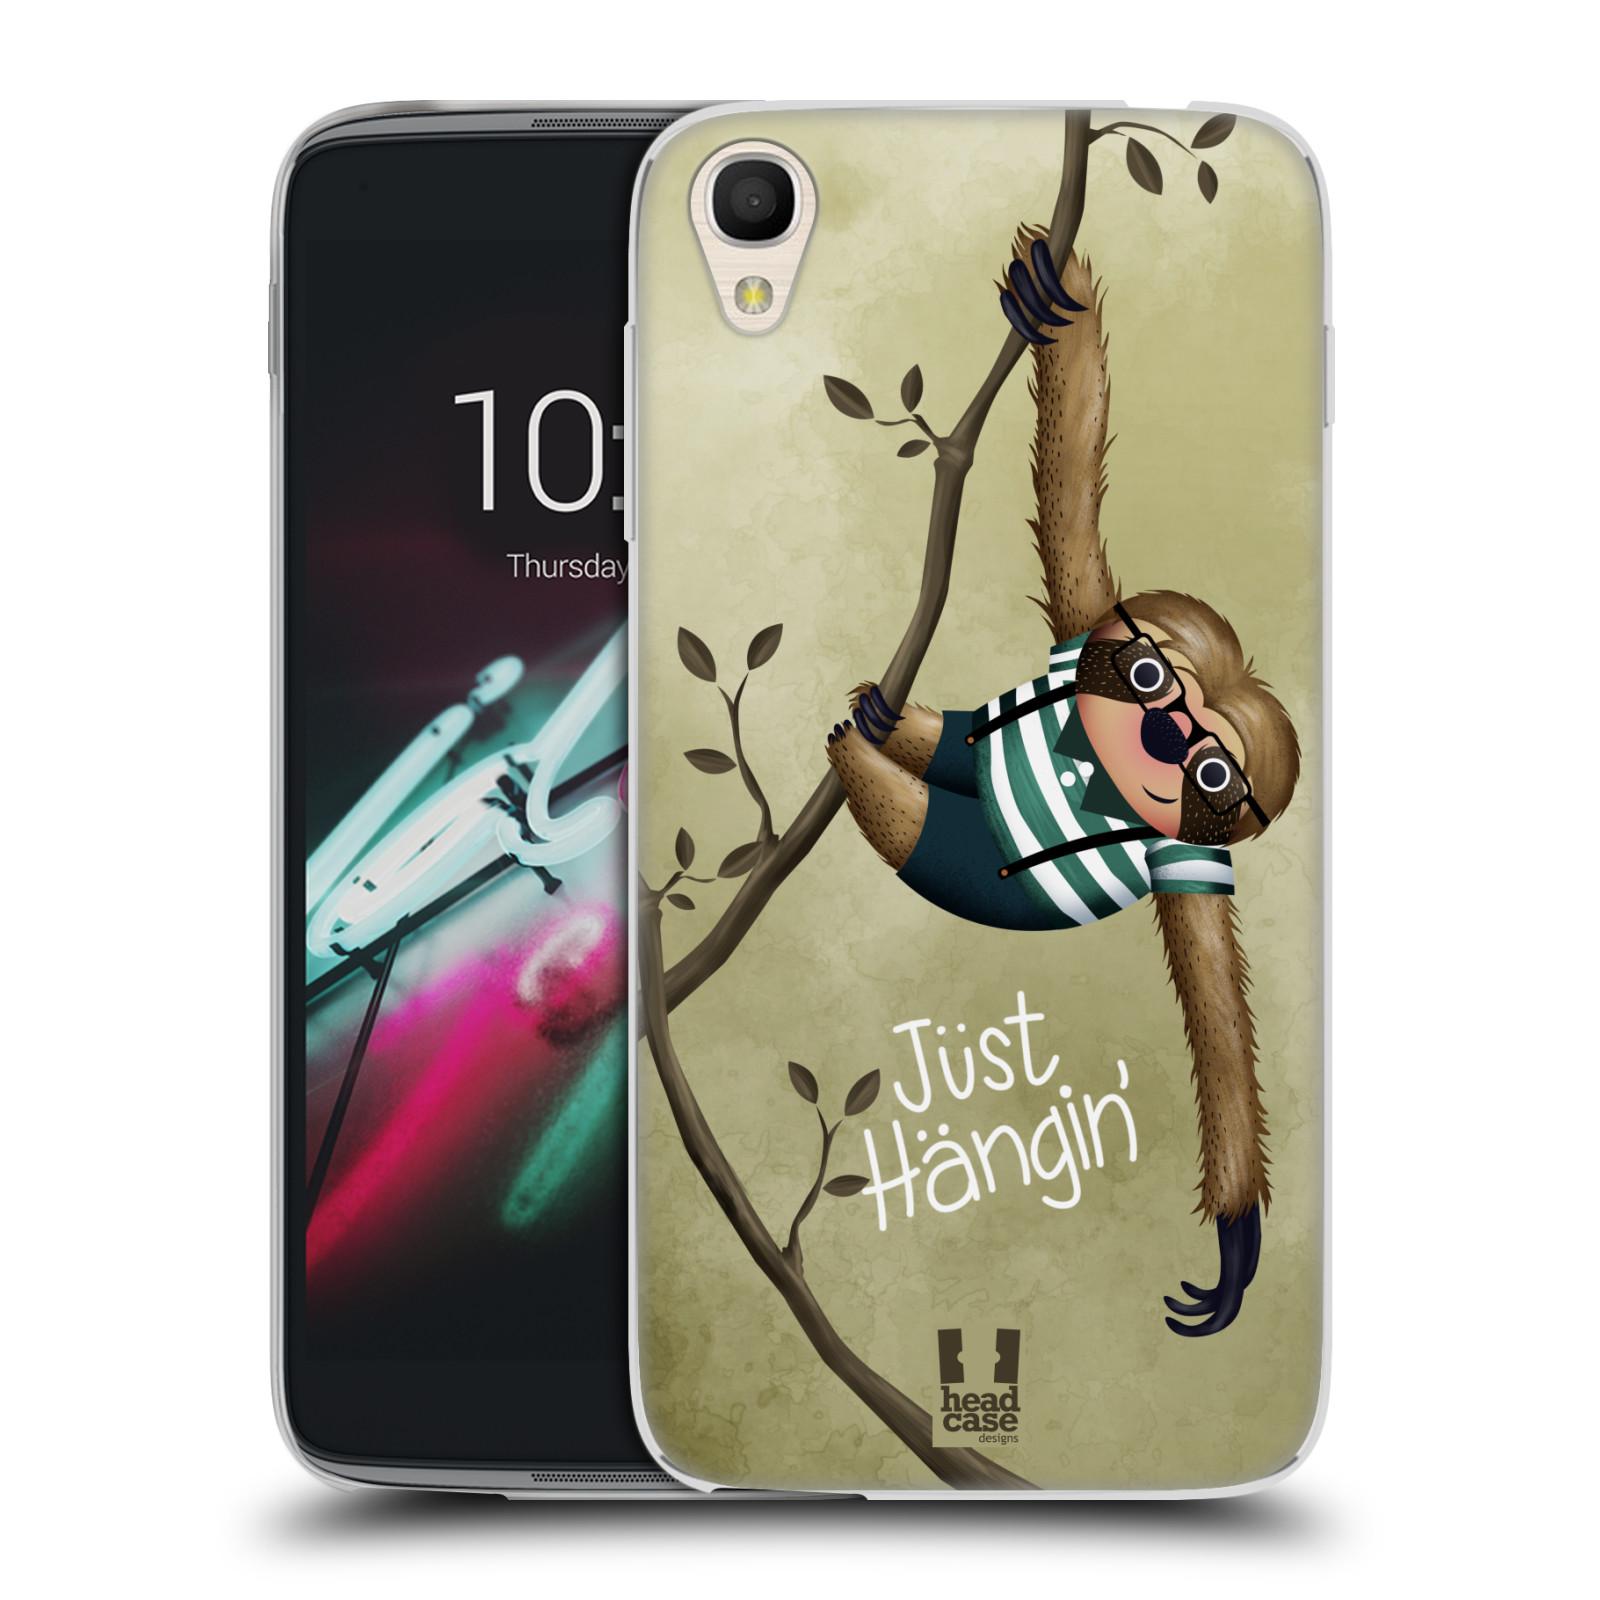 "Silikonové pouzdro na mobil Alcatel One Touch 6039Y Idol 3 HEAD CASE Lenochod Just Hangin (Silikonový kryt či obal na mobilní telefon Alcatel One Touch Idol 3 OT-6039Y s 4,7"" displejem)"